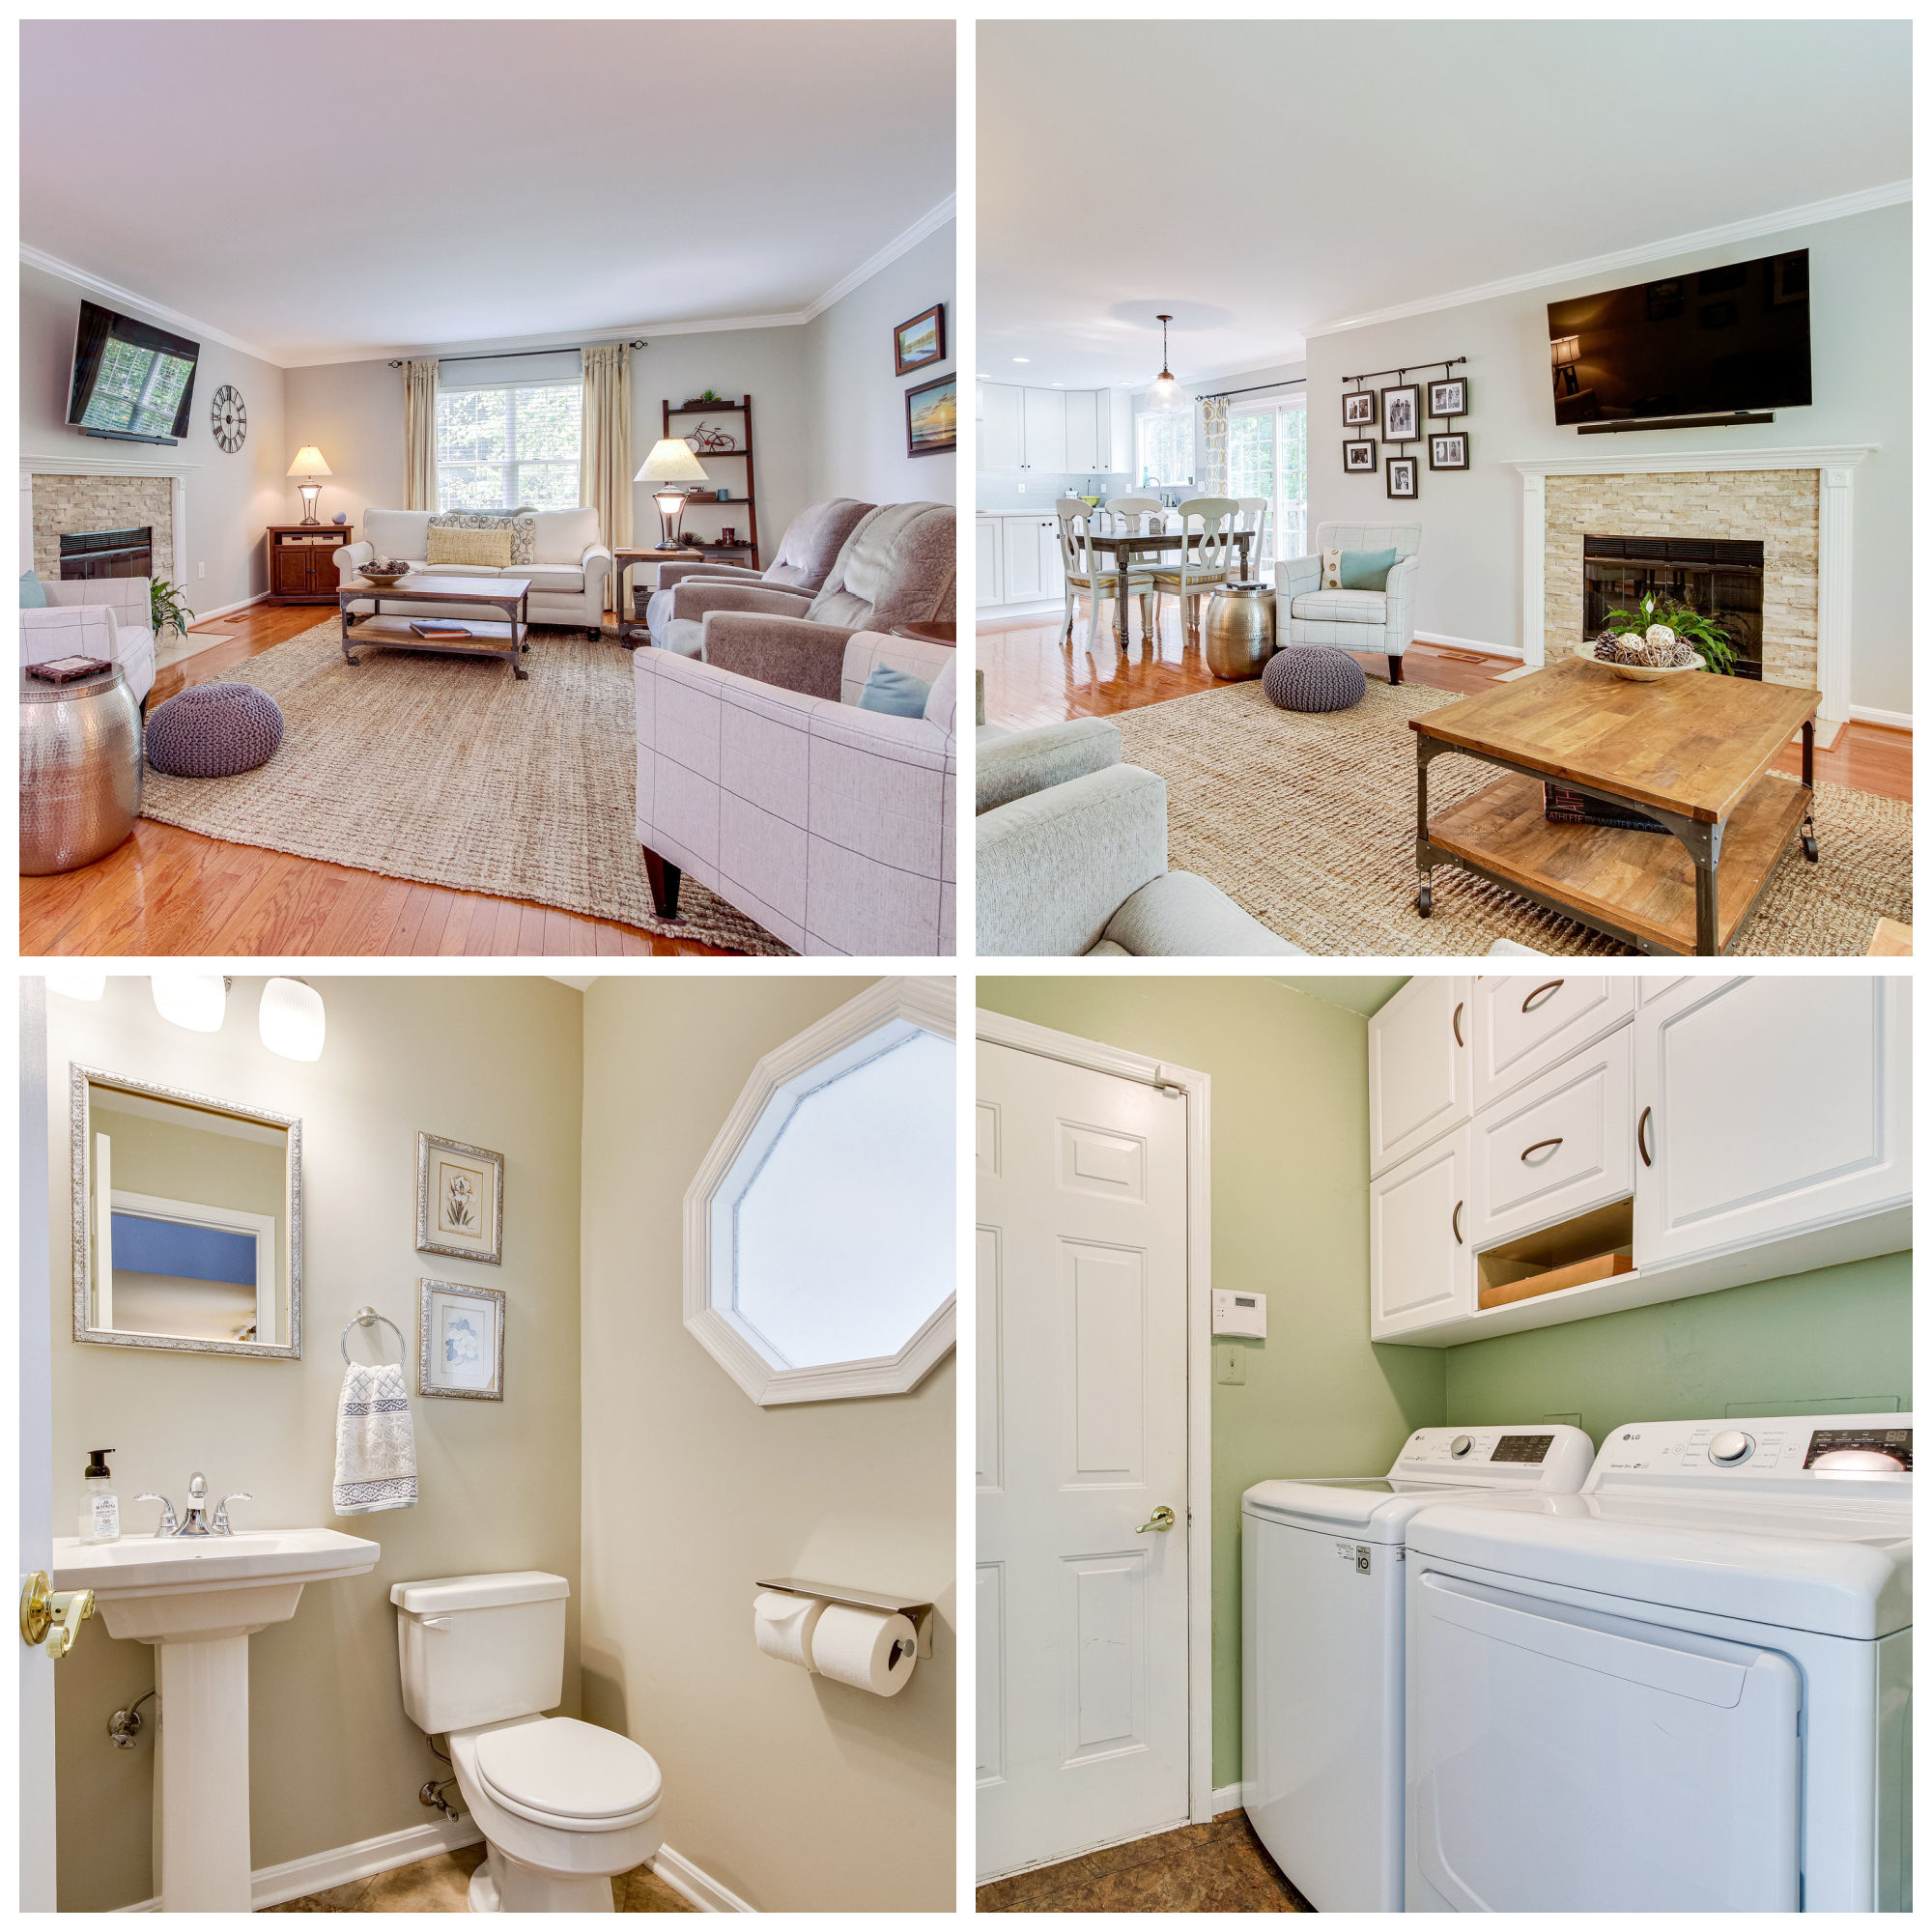 21002 Fernridge Way, Ashburn- Family Room, Powder Room, Laundry Room